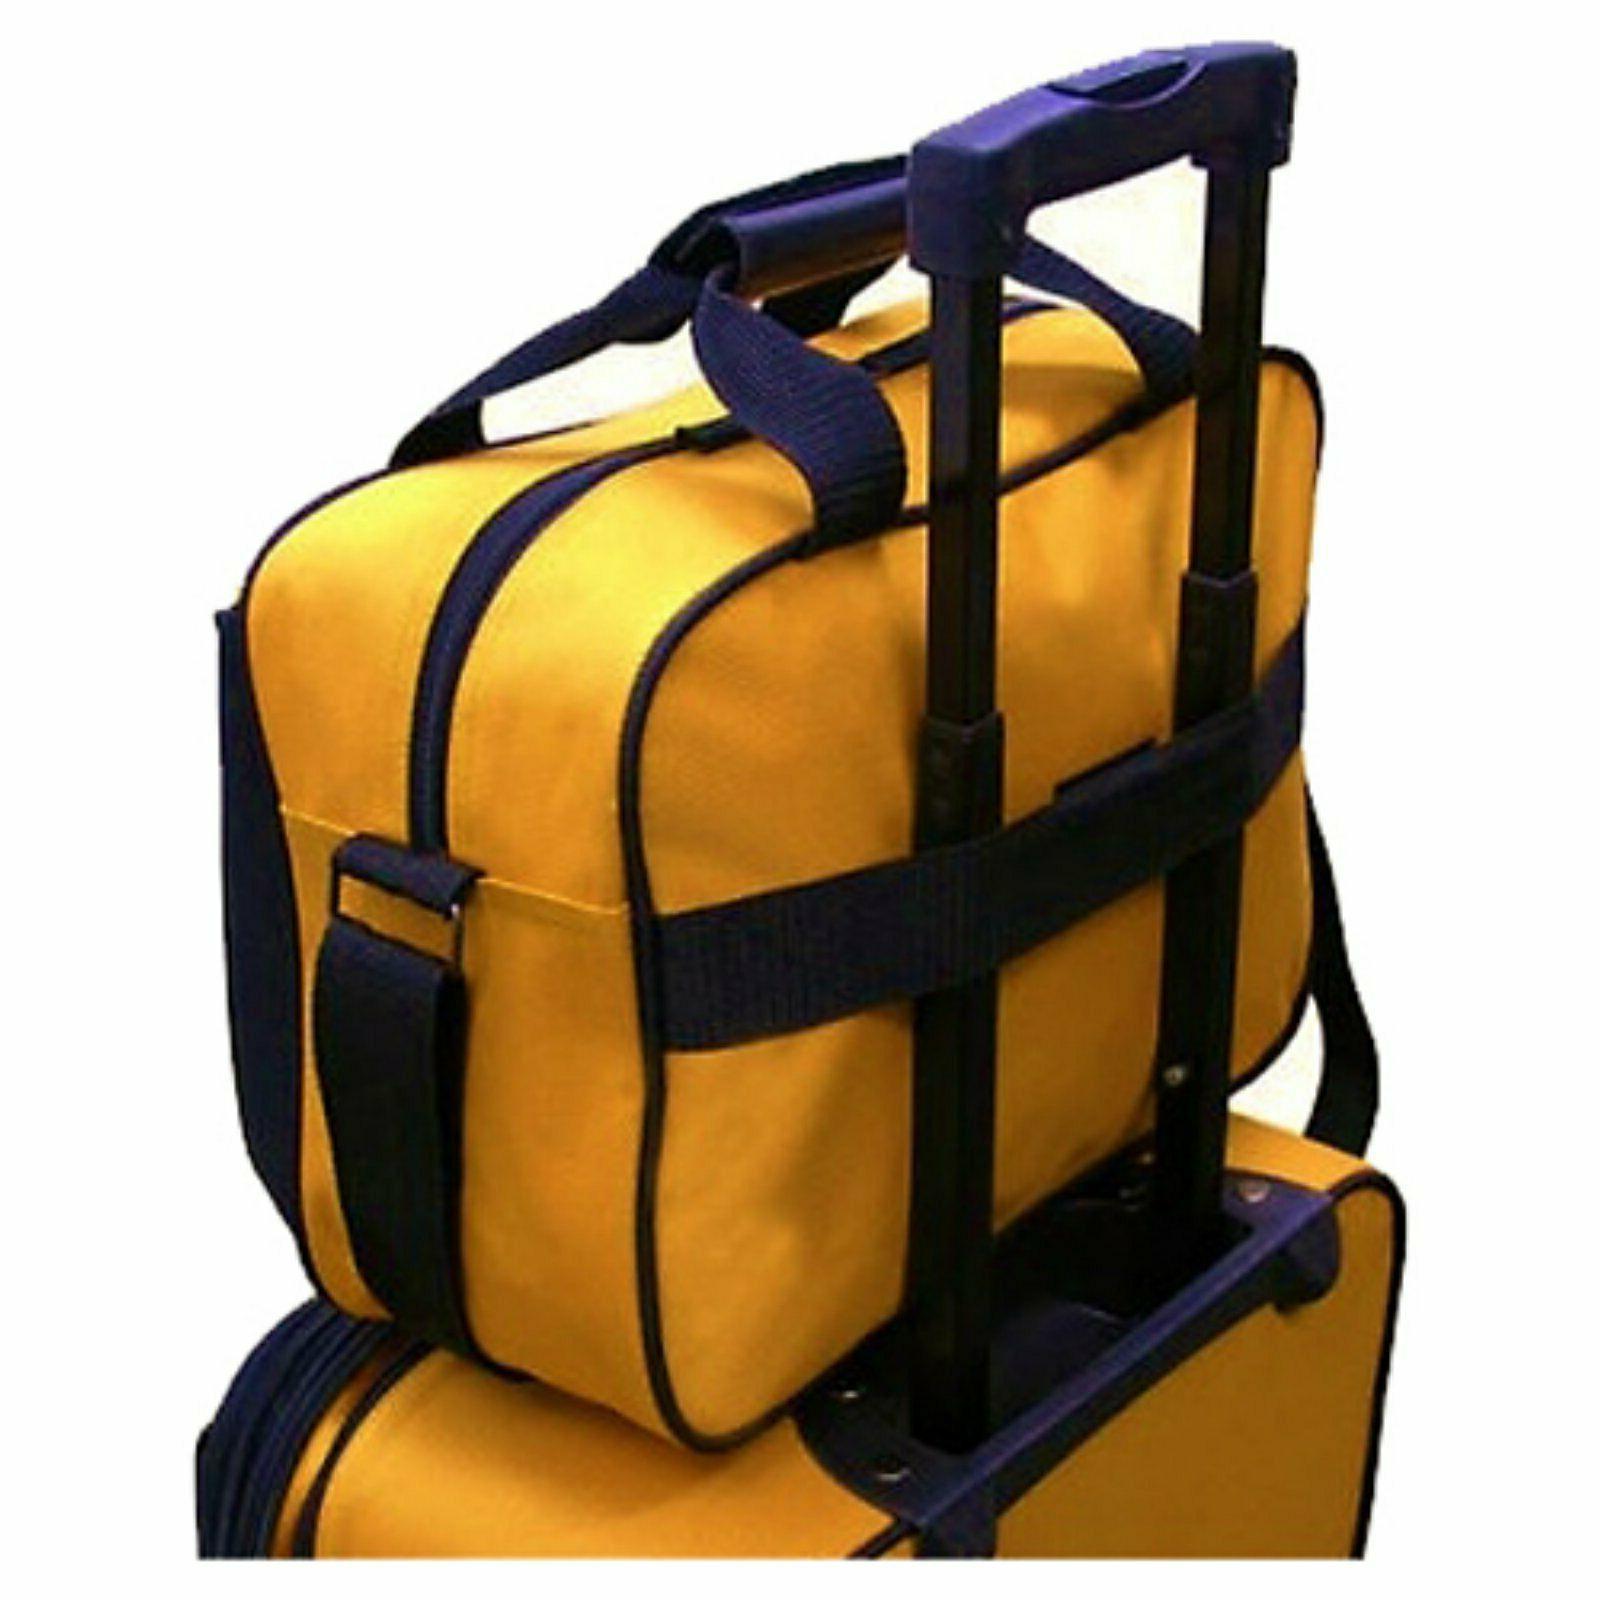 U.S. Traveler Carry